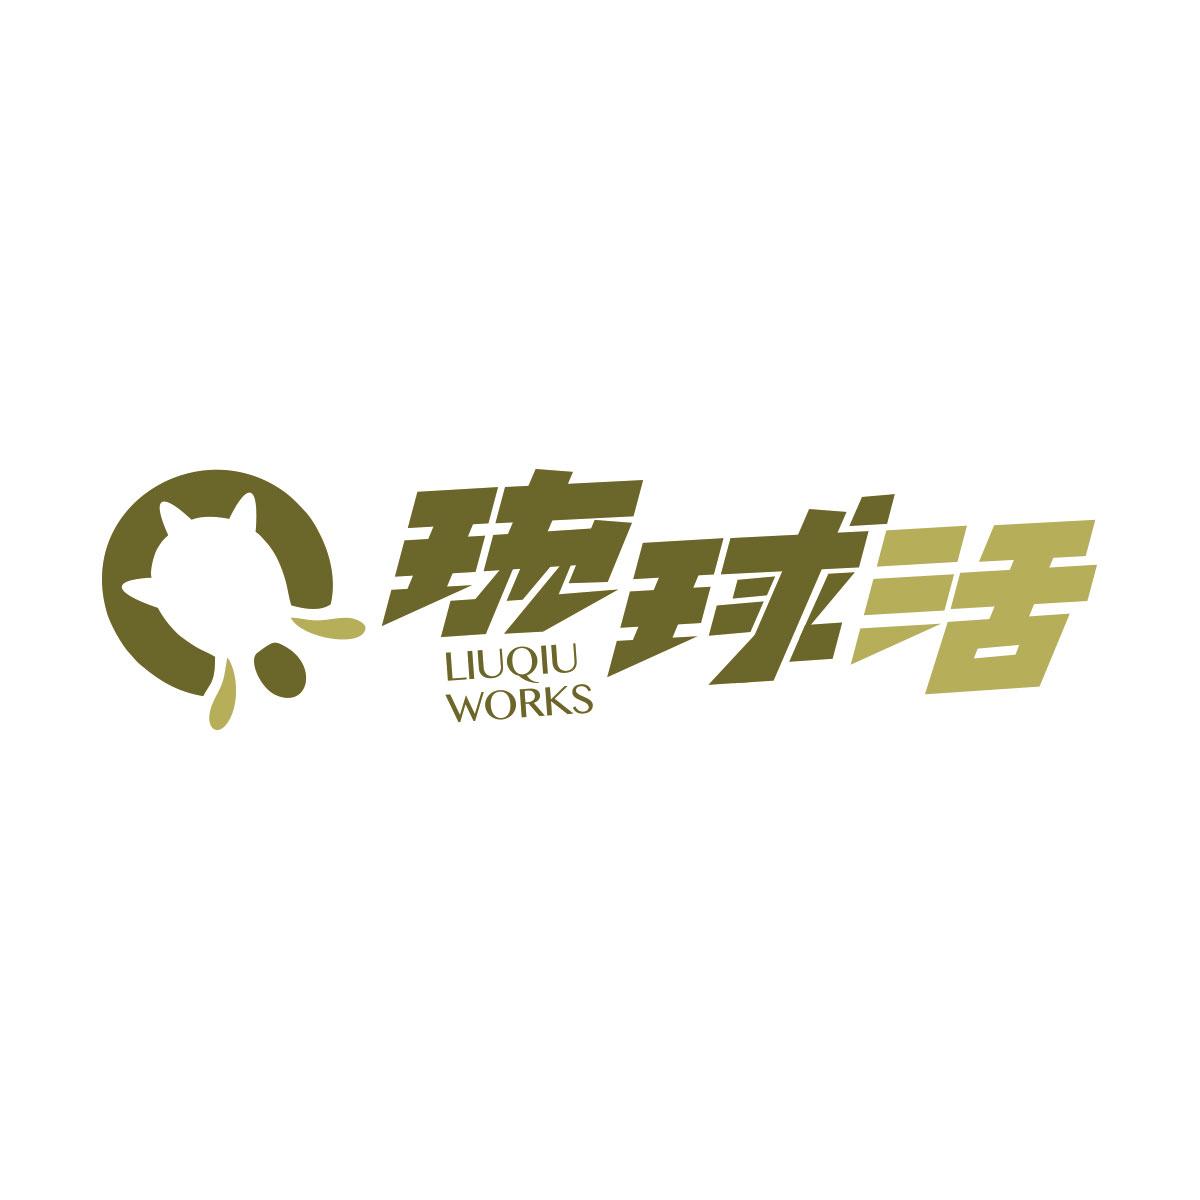 liuqiuwork-square-logo2.jpg